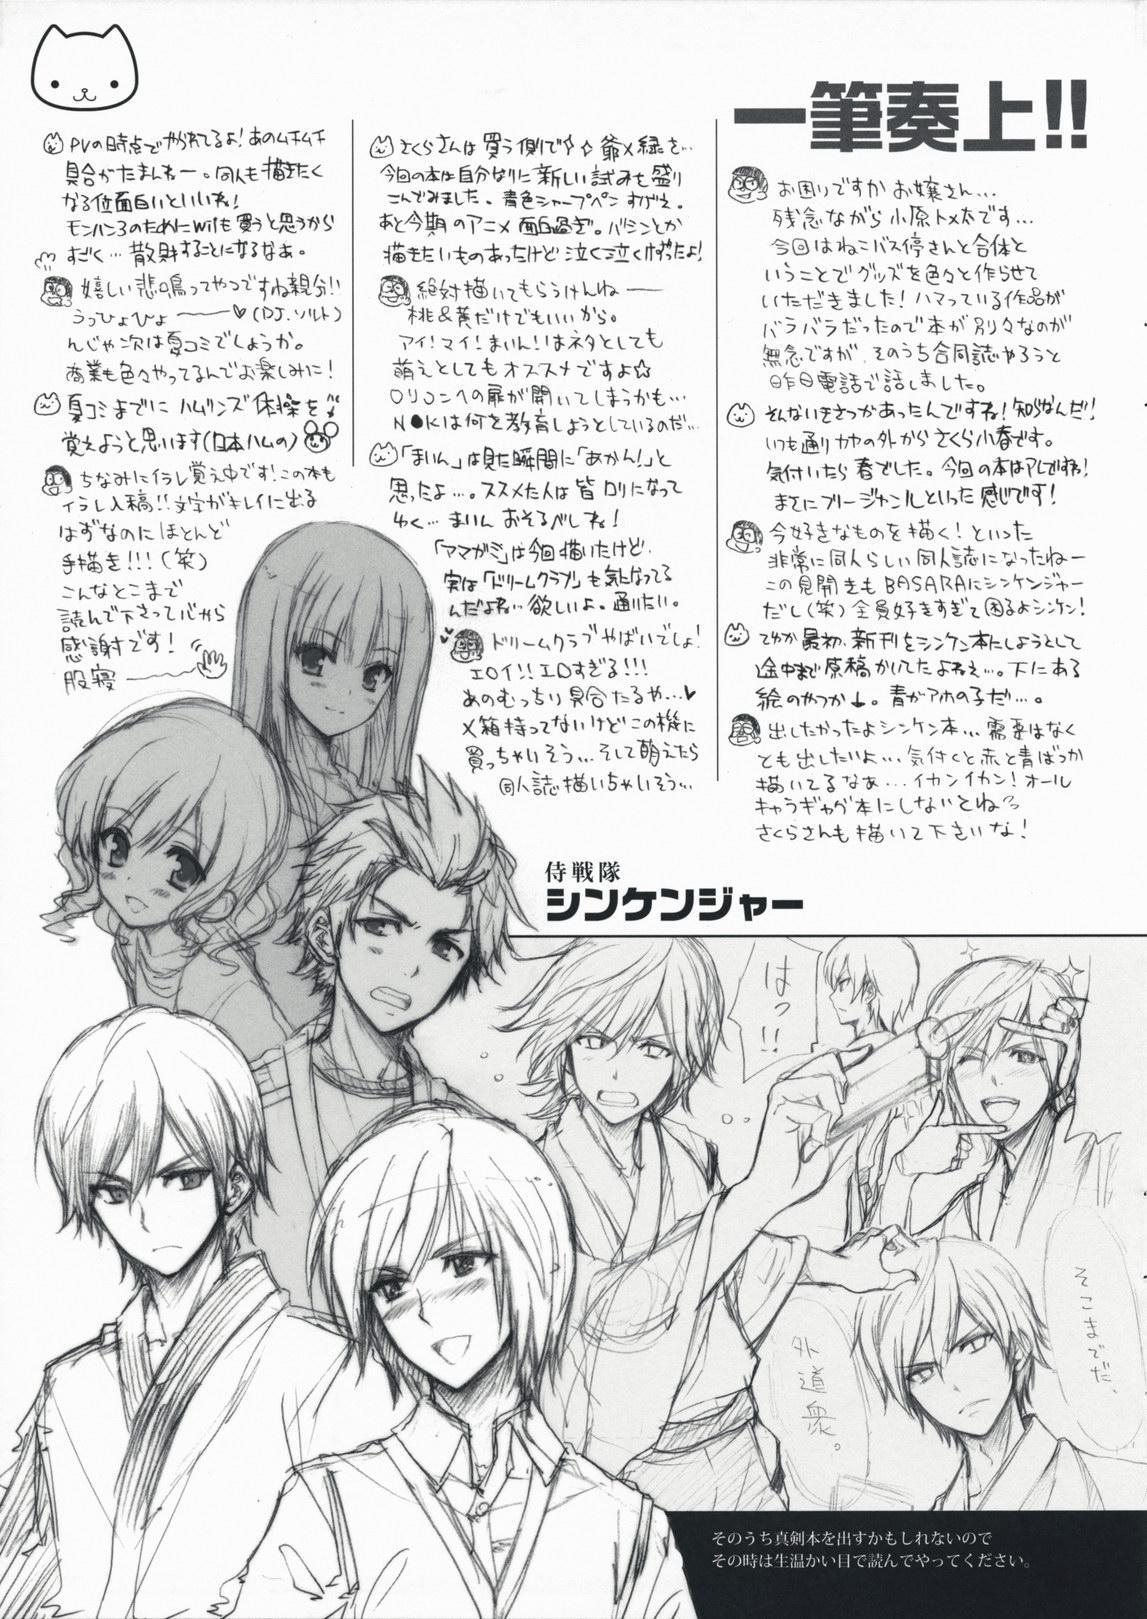 Shichibuzaki Crawl 14